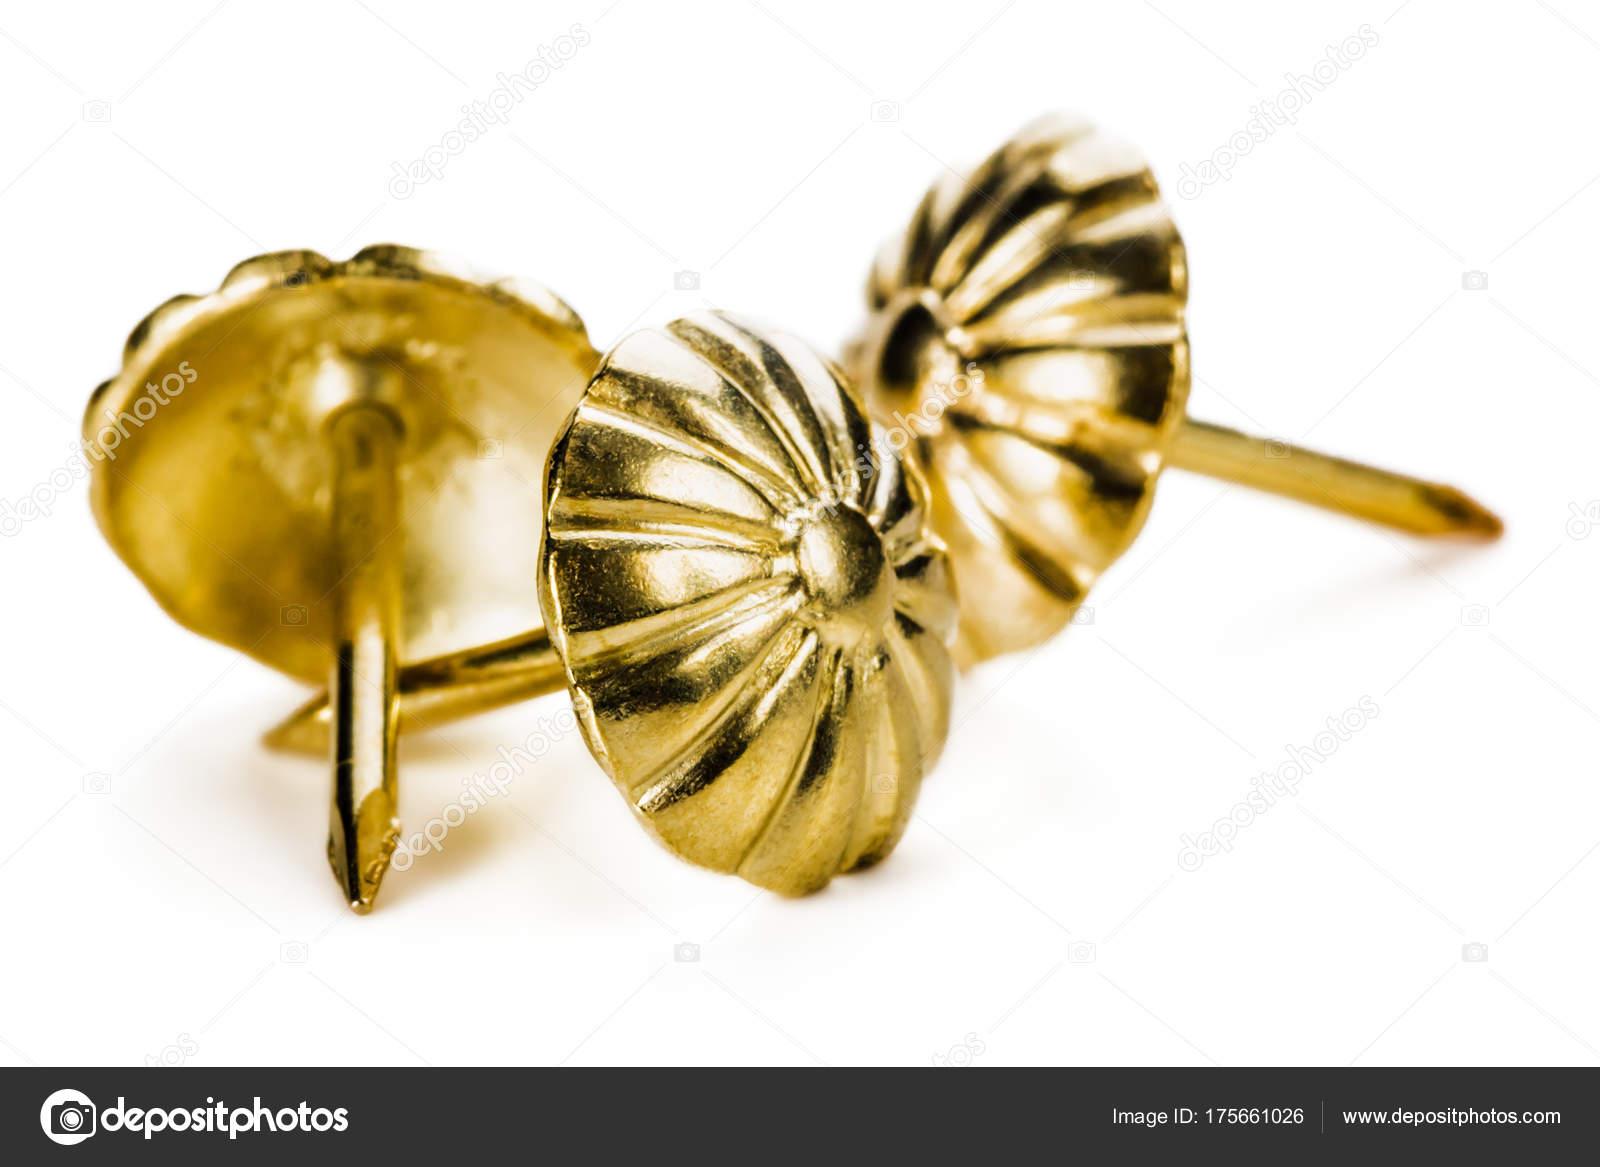 Decorative Furniture Nails — Stock Photo © pilotL39 #175661026